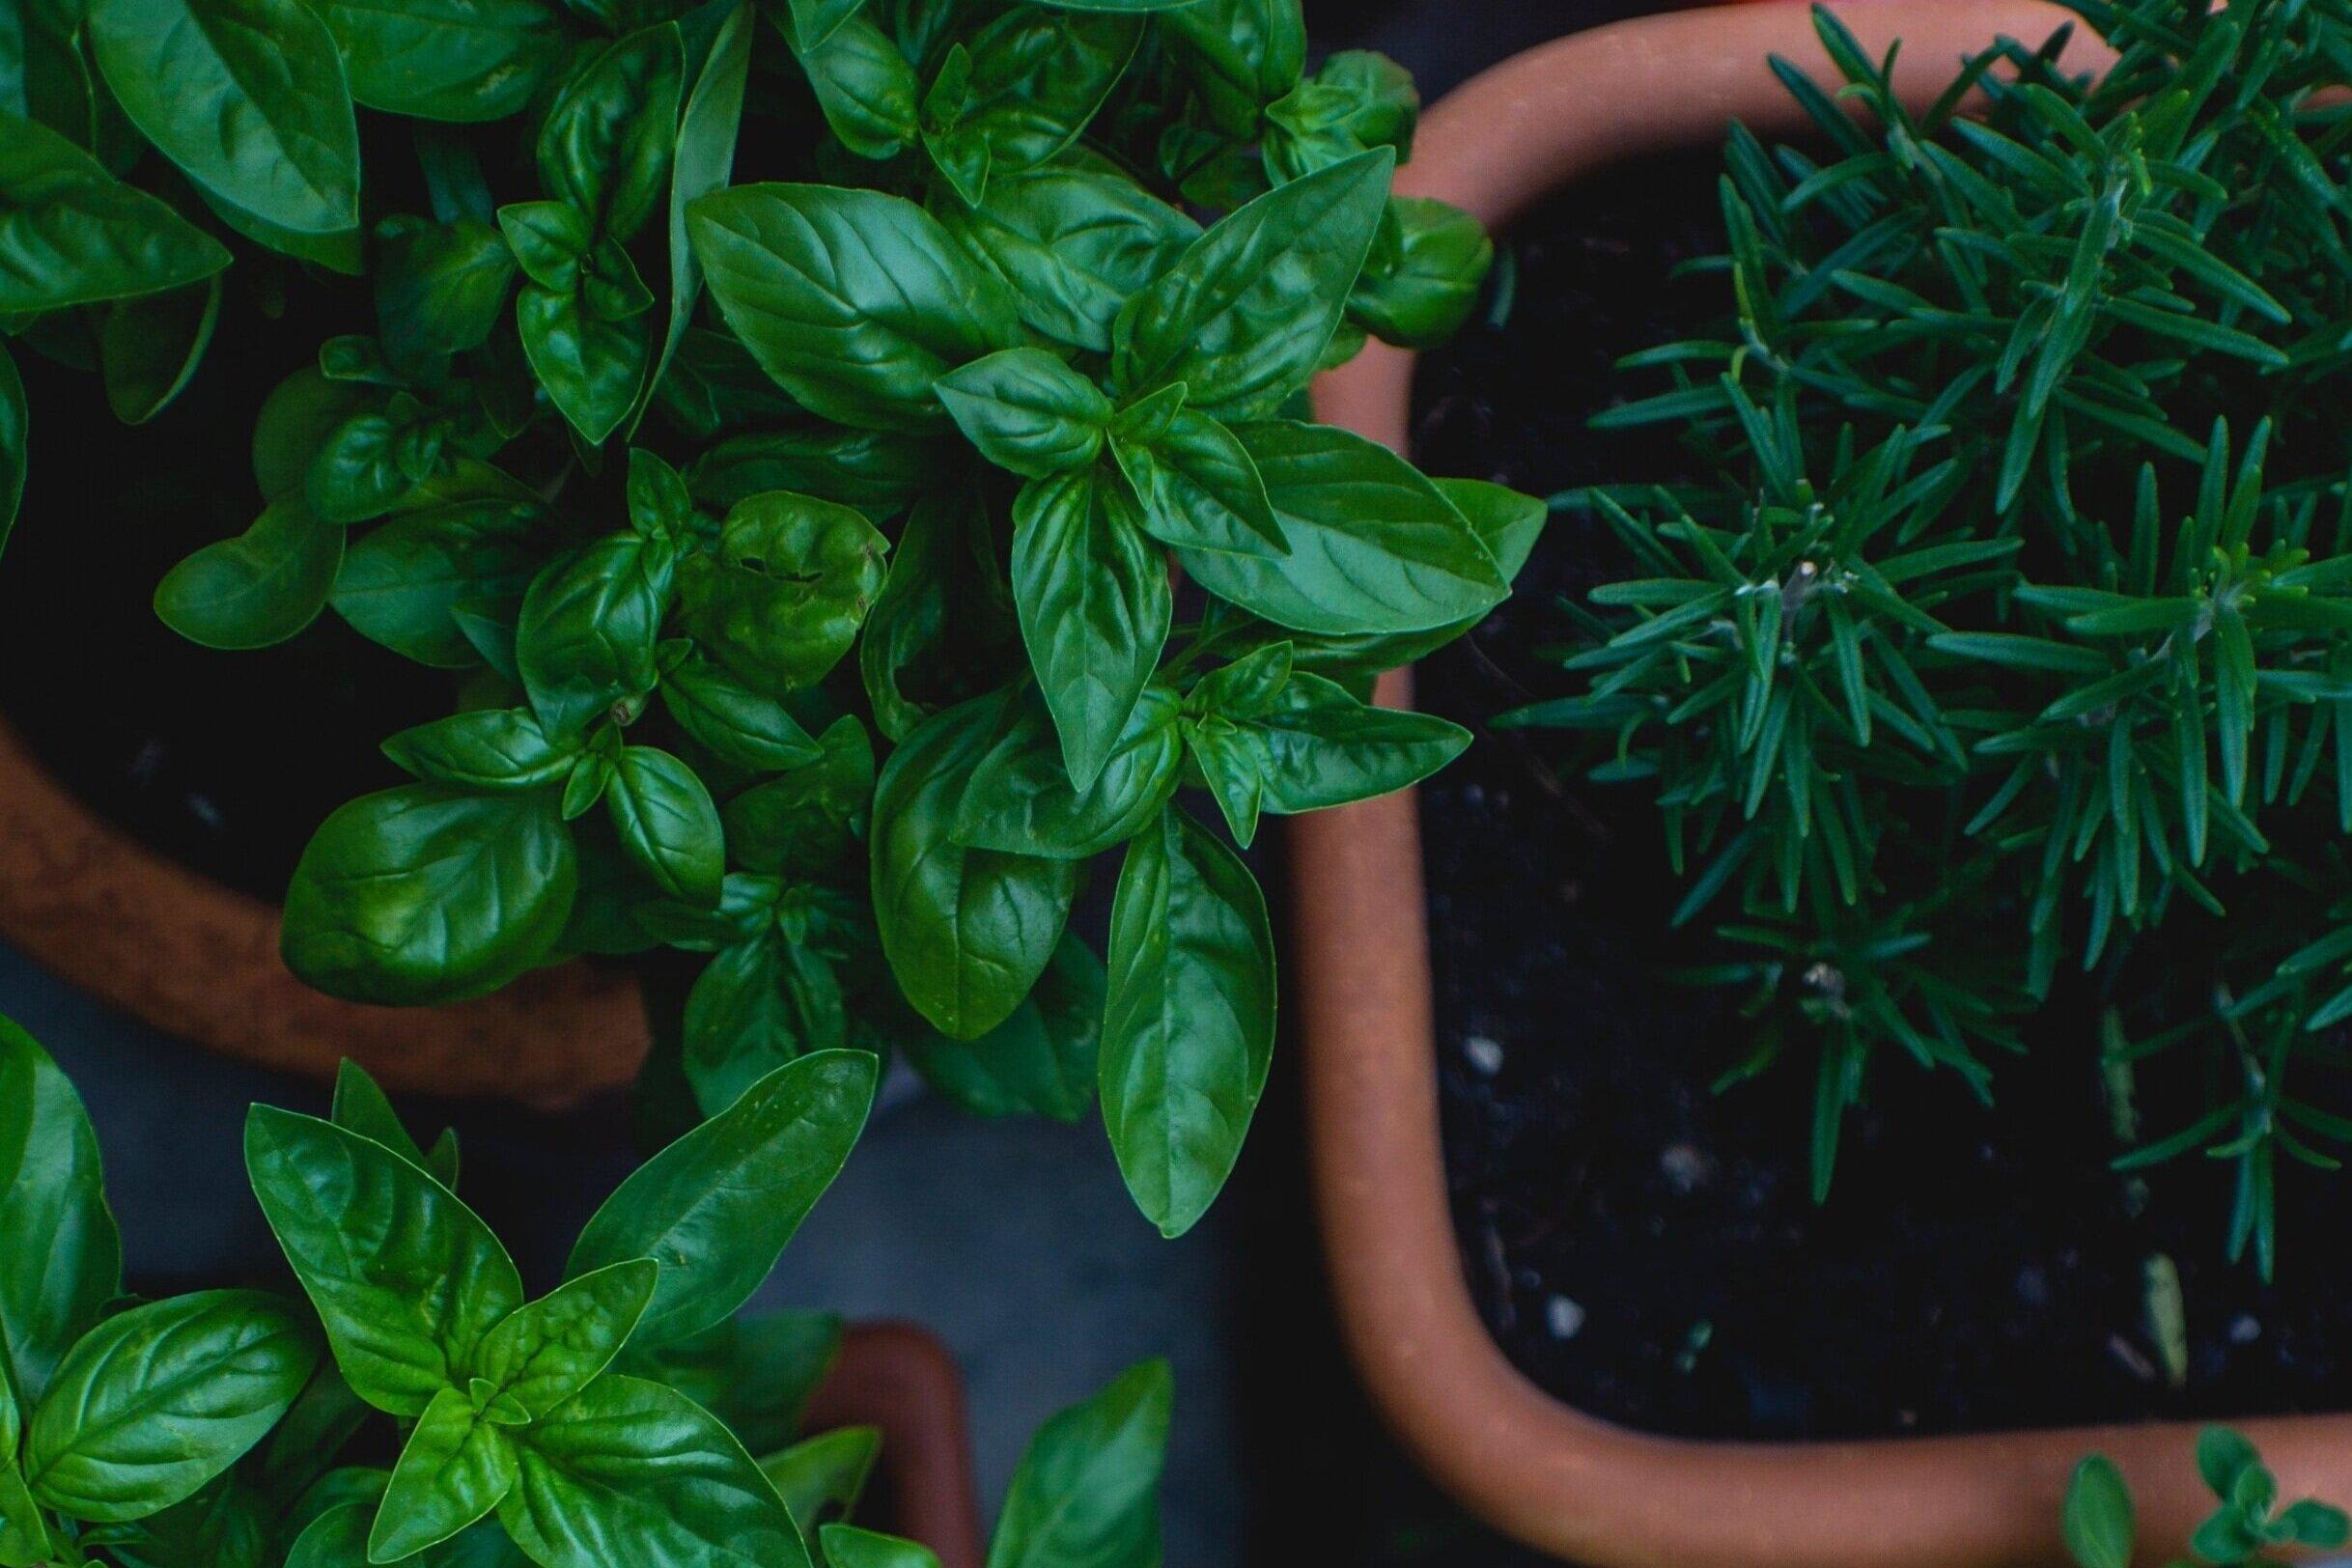 Indoor Gardening Workshops - Gardening is the ultimate wellness activity, we teach you how to grow plants in your home.